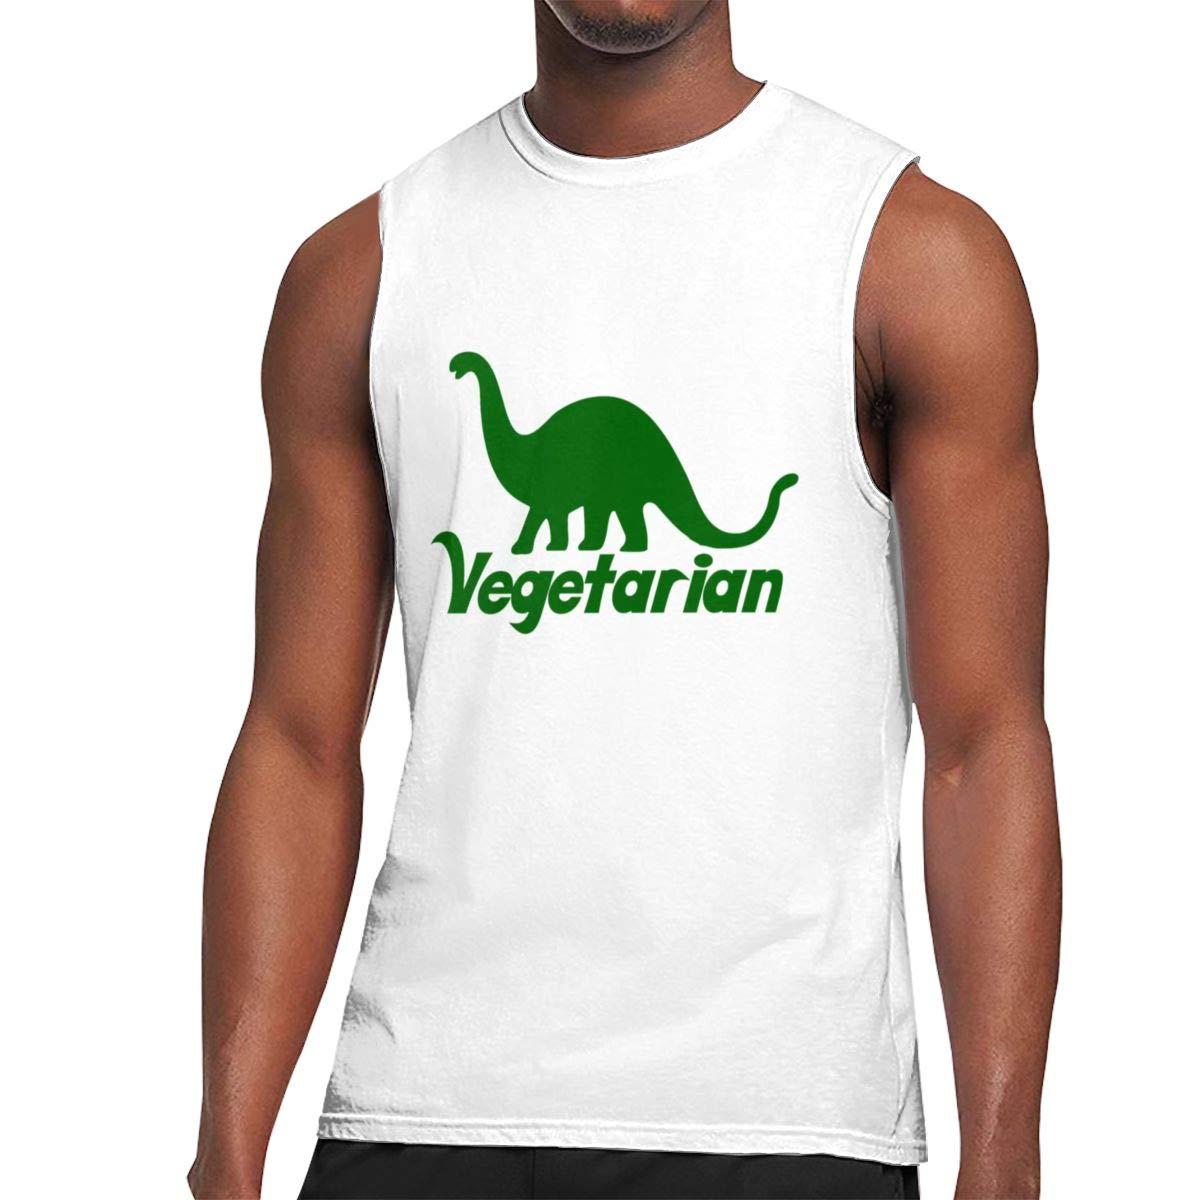 Seuriamin Vegetarian Dinosaur S Fashion Outdoor Sleeveless Muscle Short Sleeve T Shirts